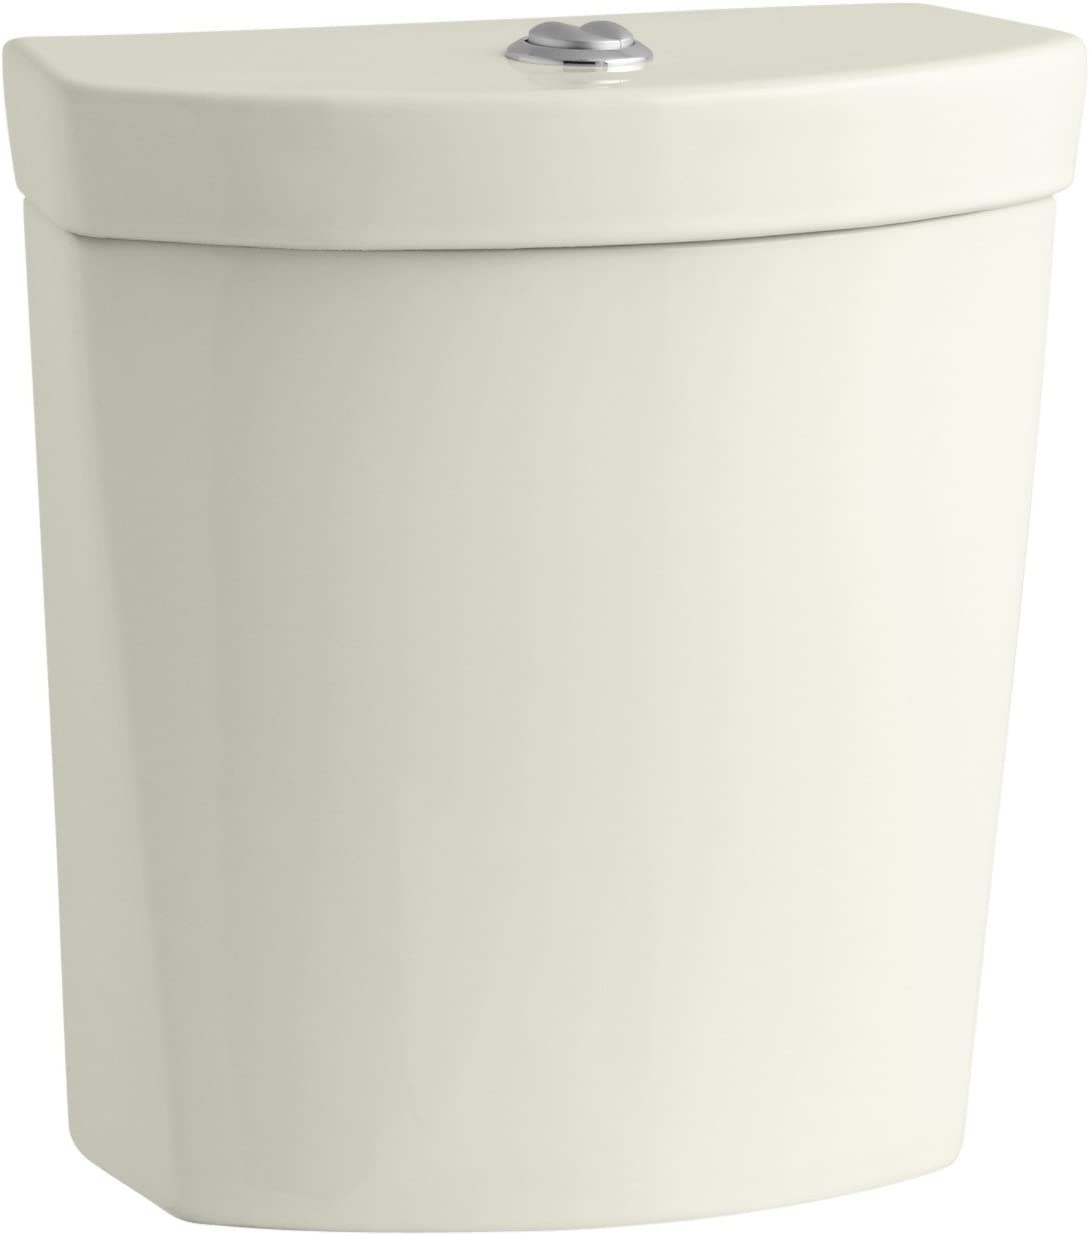 Kohler K-4419-96 Persuade Biscuit Max 82% OFF Tank Trust Toilet